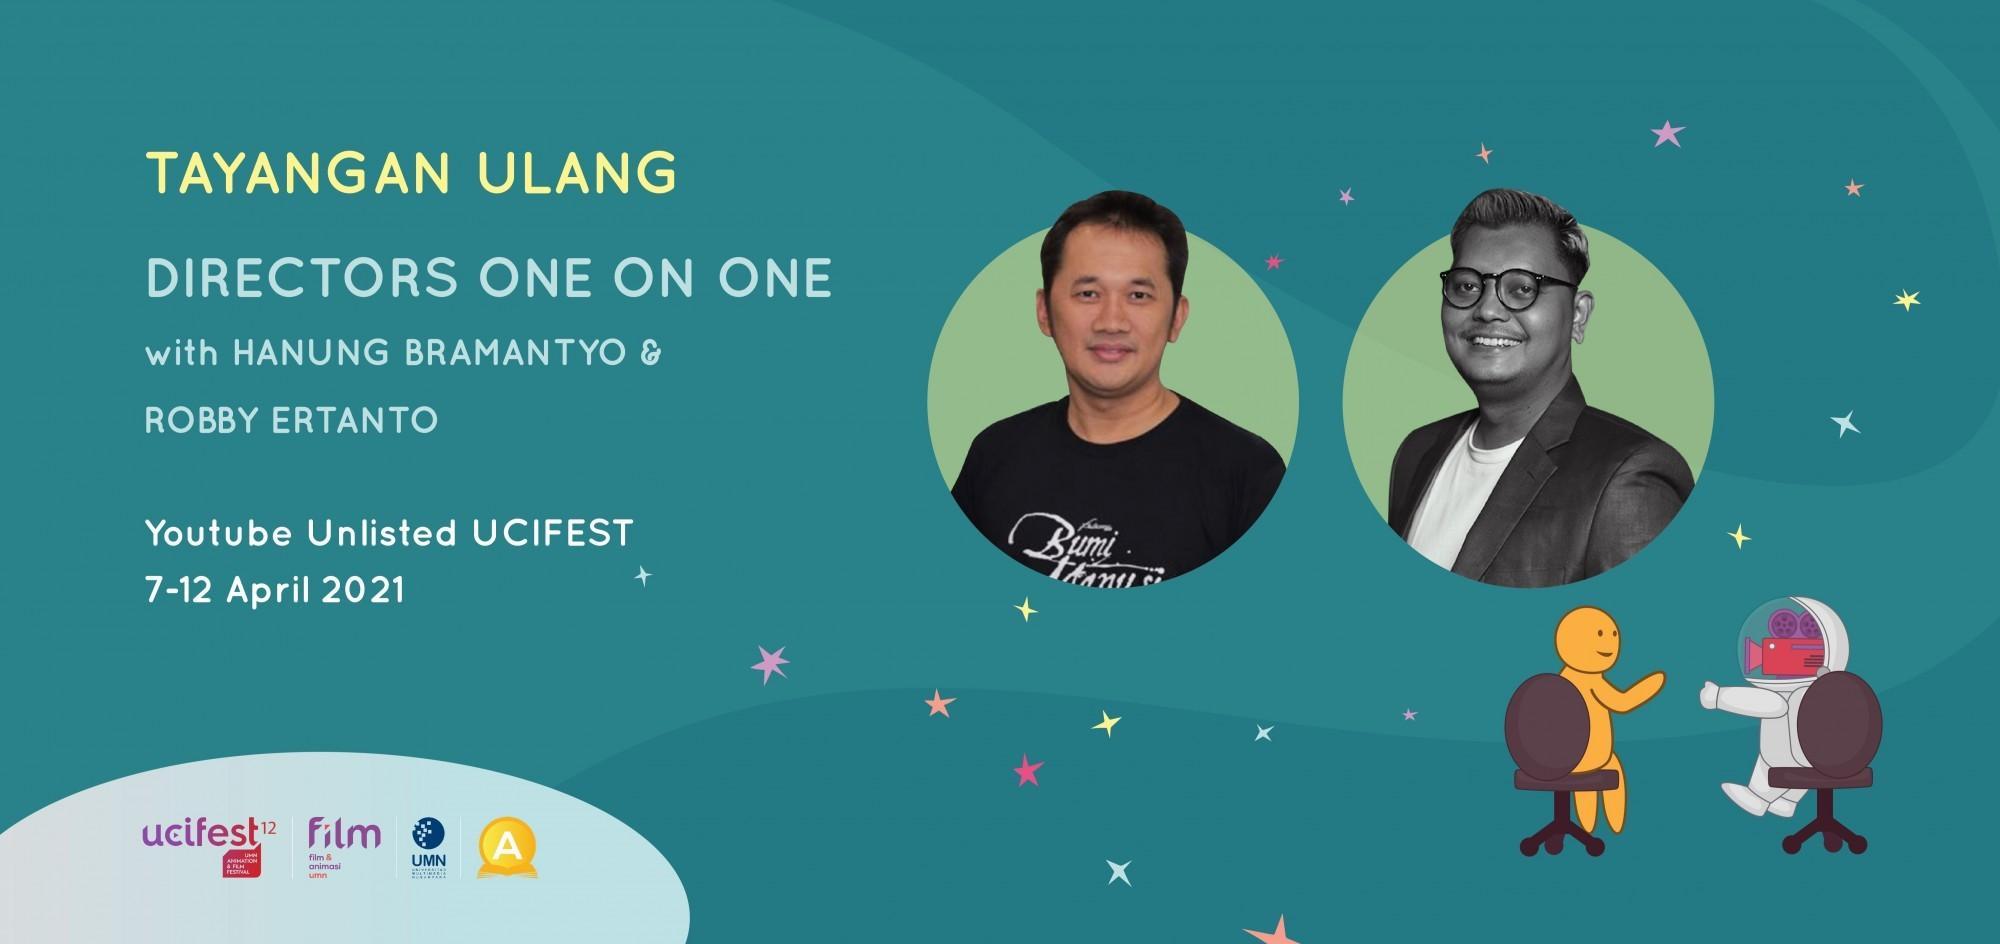 TAYANGAN ULANG DIRECTORS ONE ON ONE WITH HANUNG BRAMANTYO & ROBBY ERTANTO